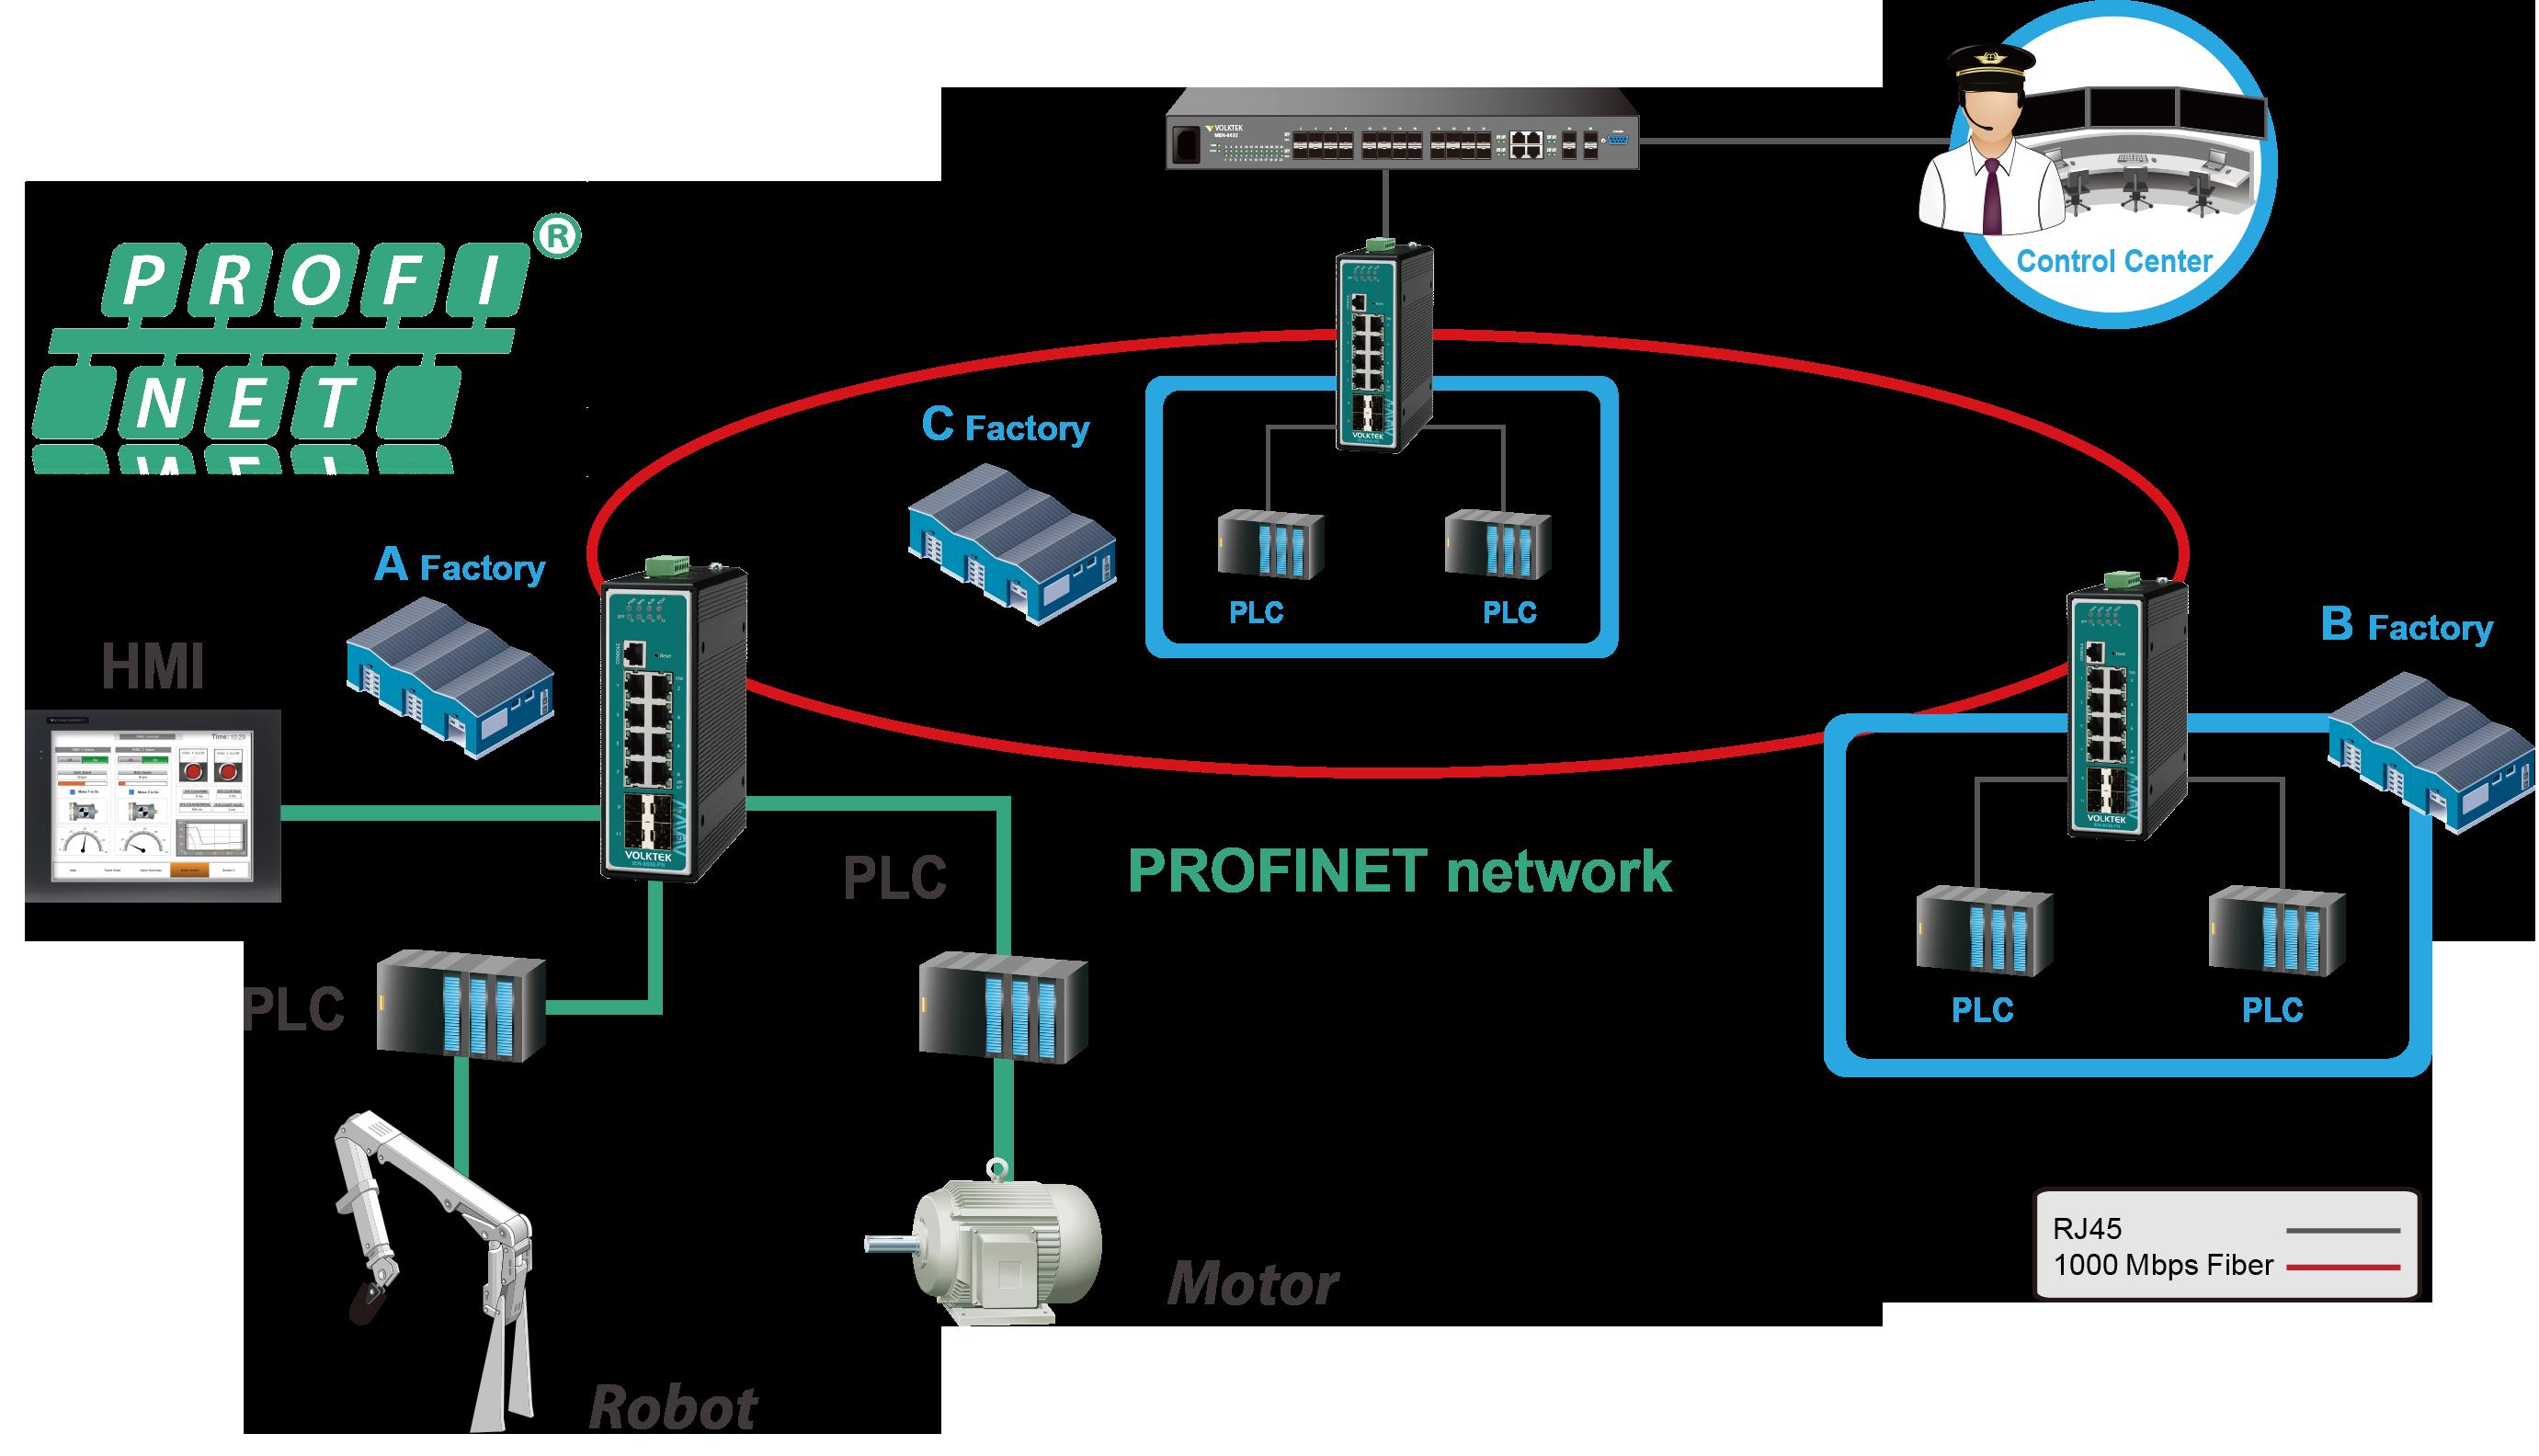 PROFINET Application Diagram